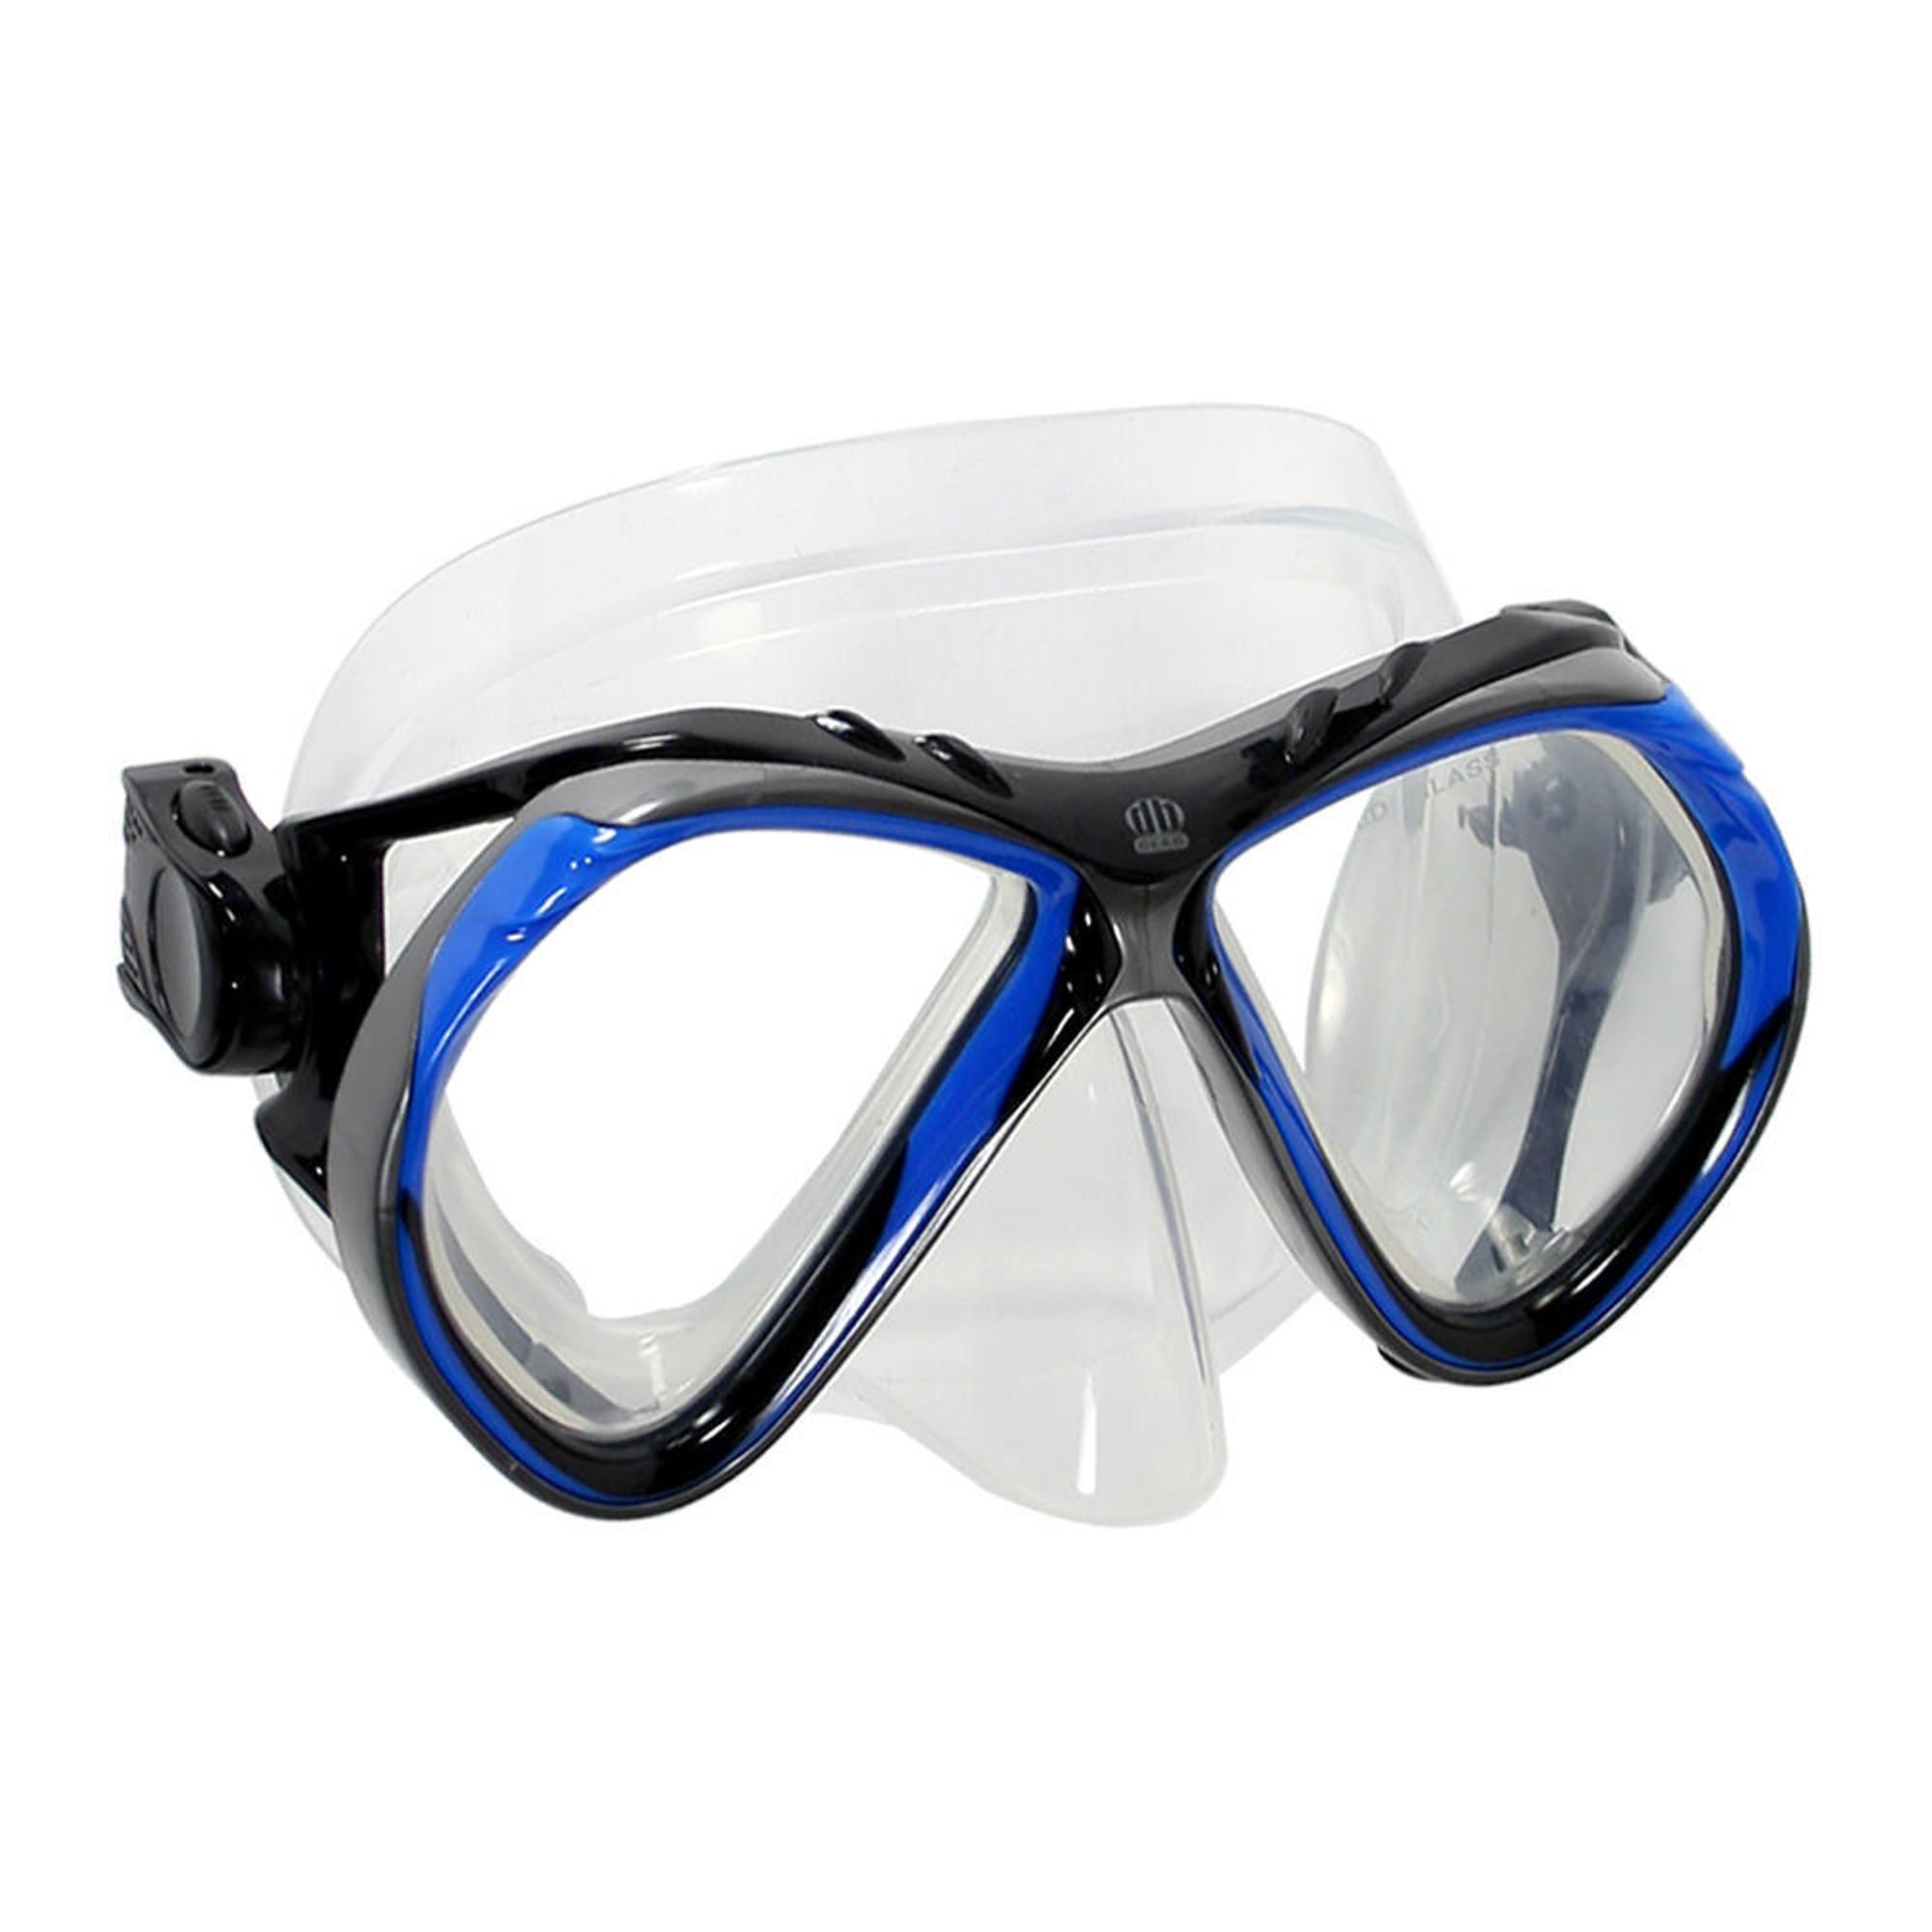 Del Sol 2 - Diving/Snorkeling Mask